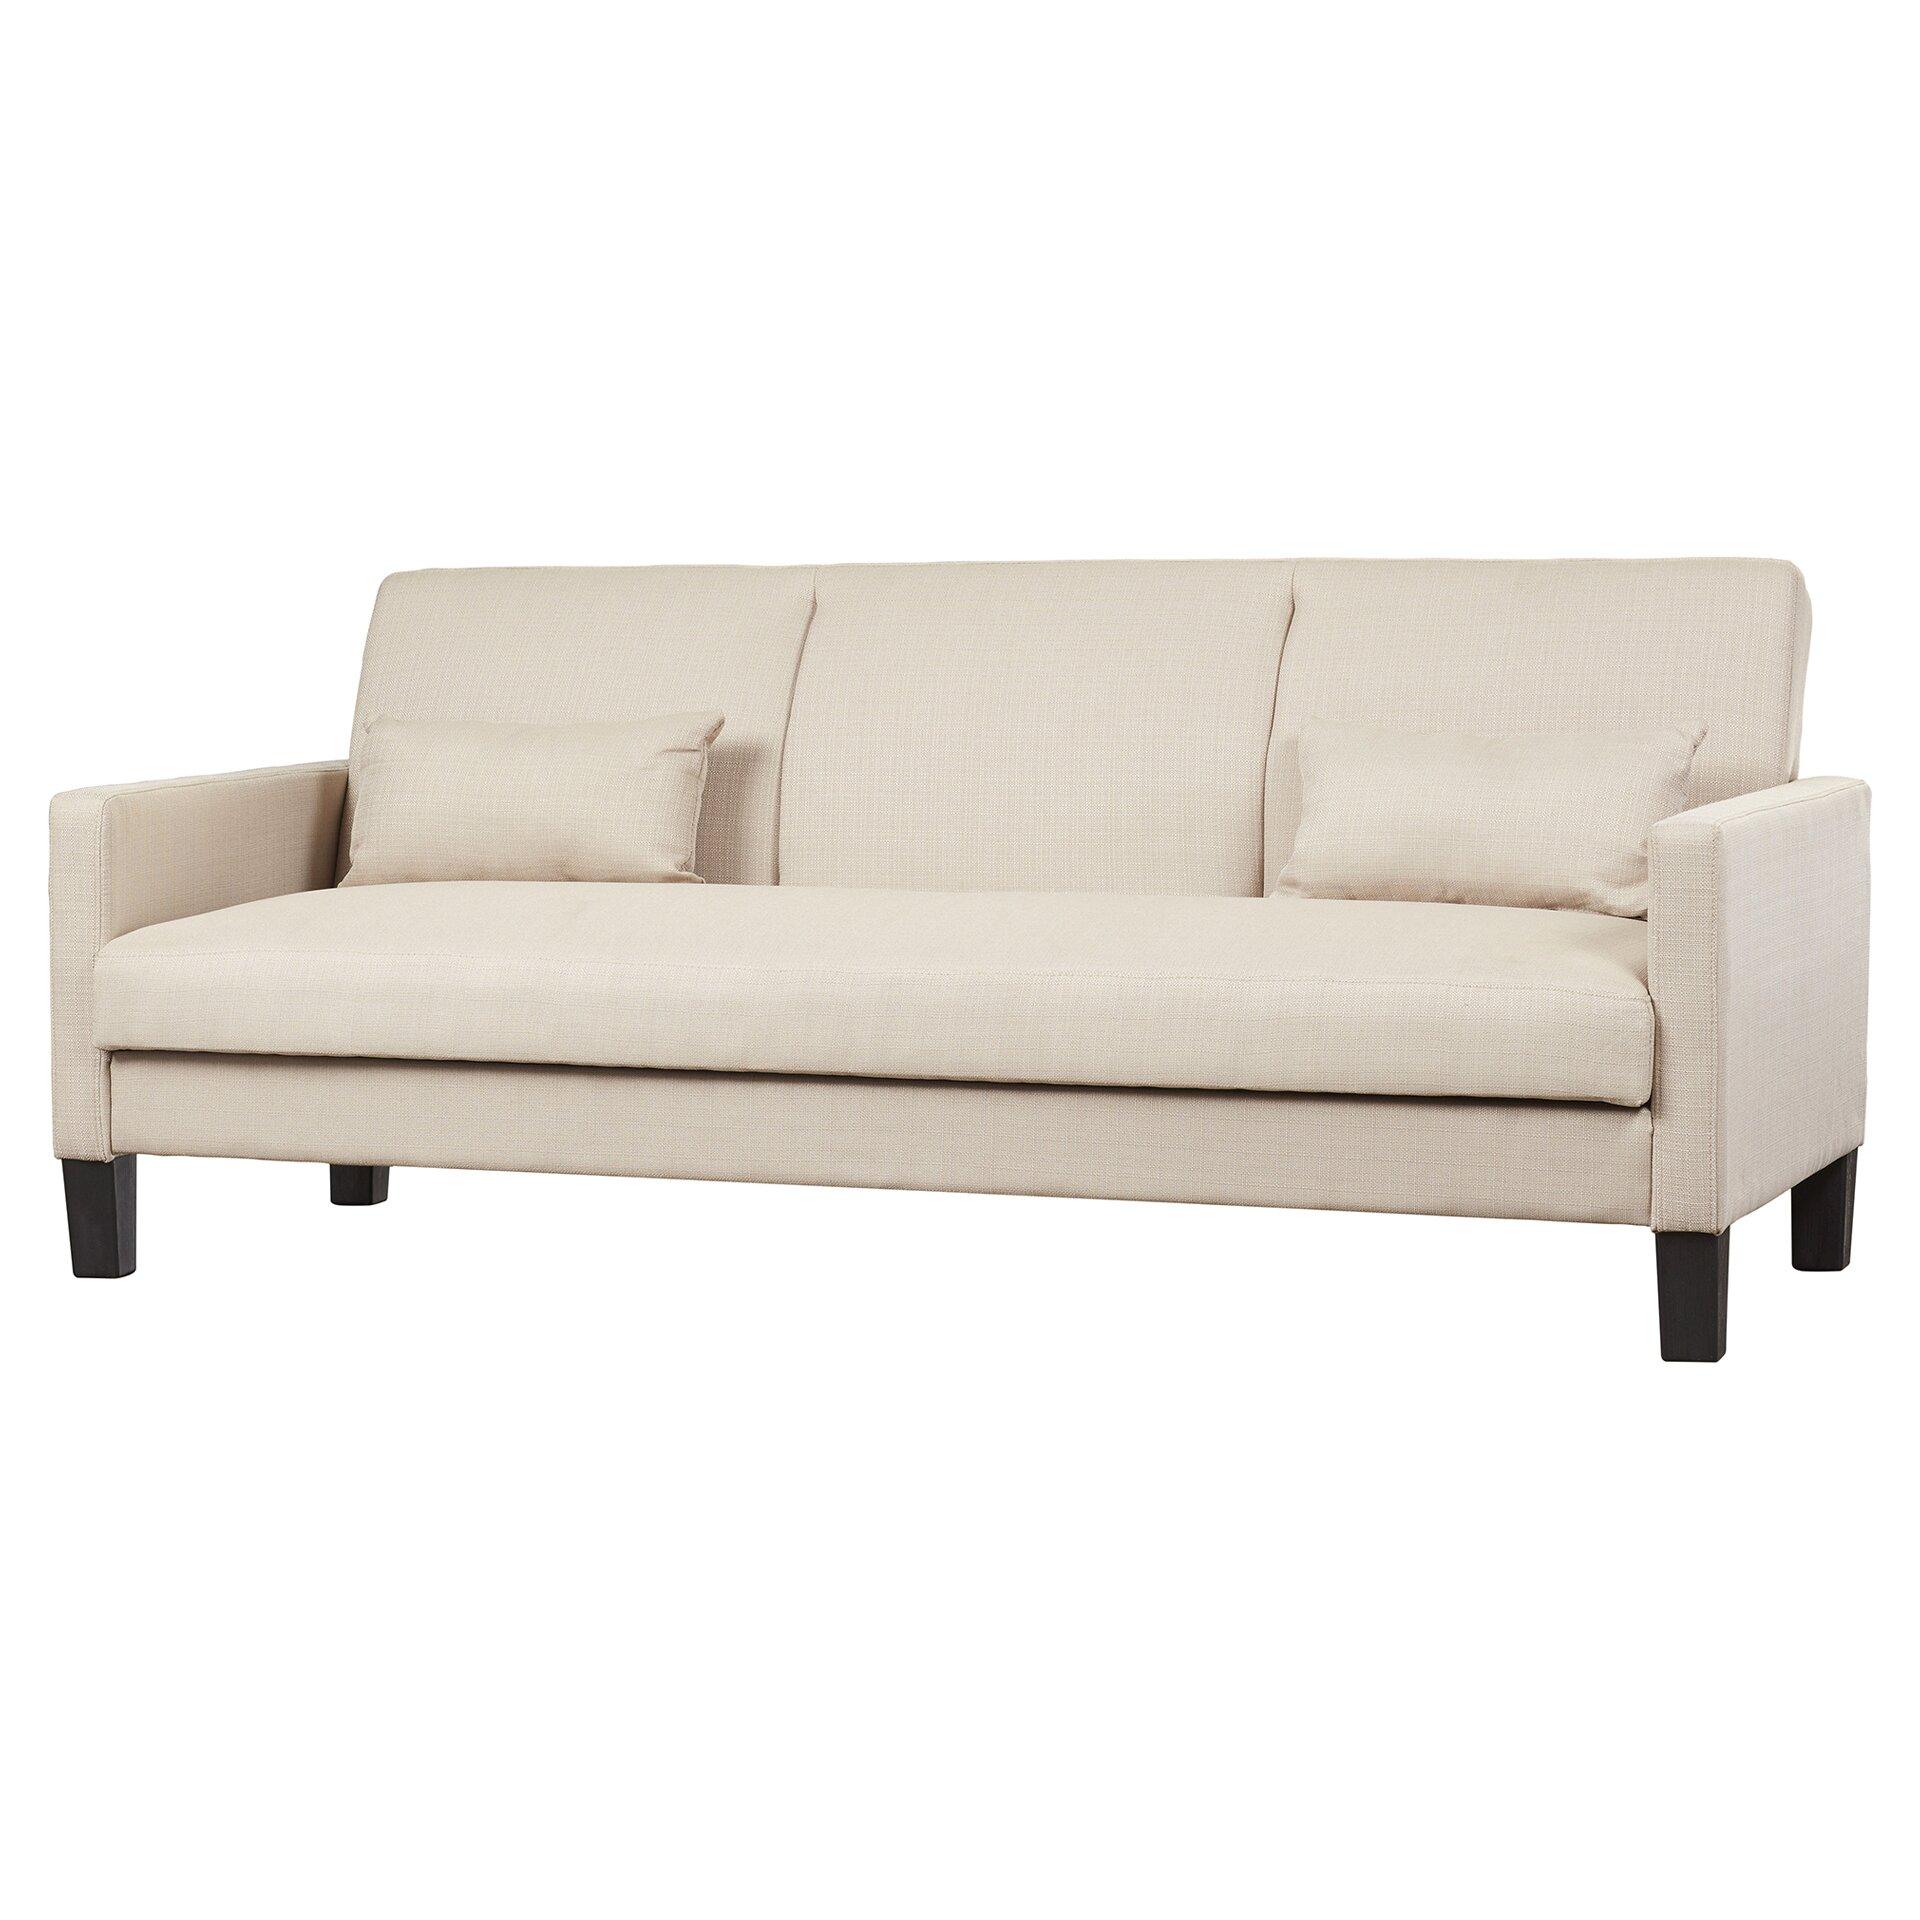 zipcode design hudson sleeper sofa reviews wayfair. Black Bedroom Furniture Sets. Home Design Ideas